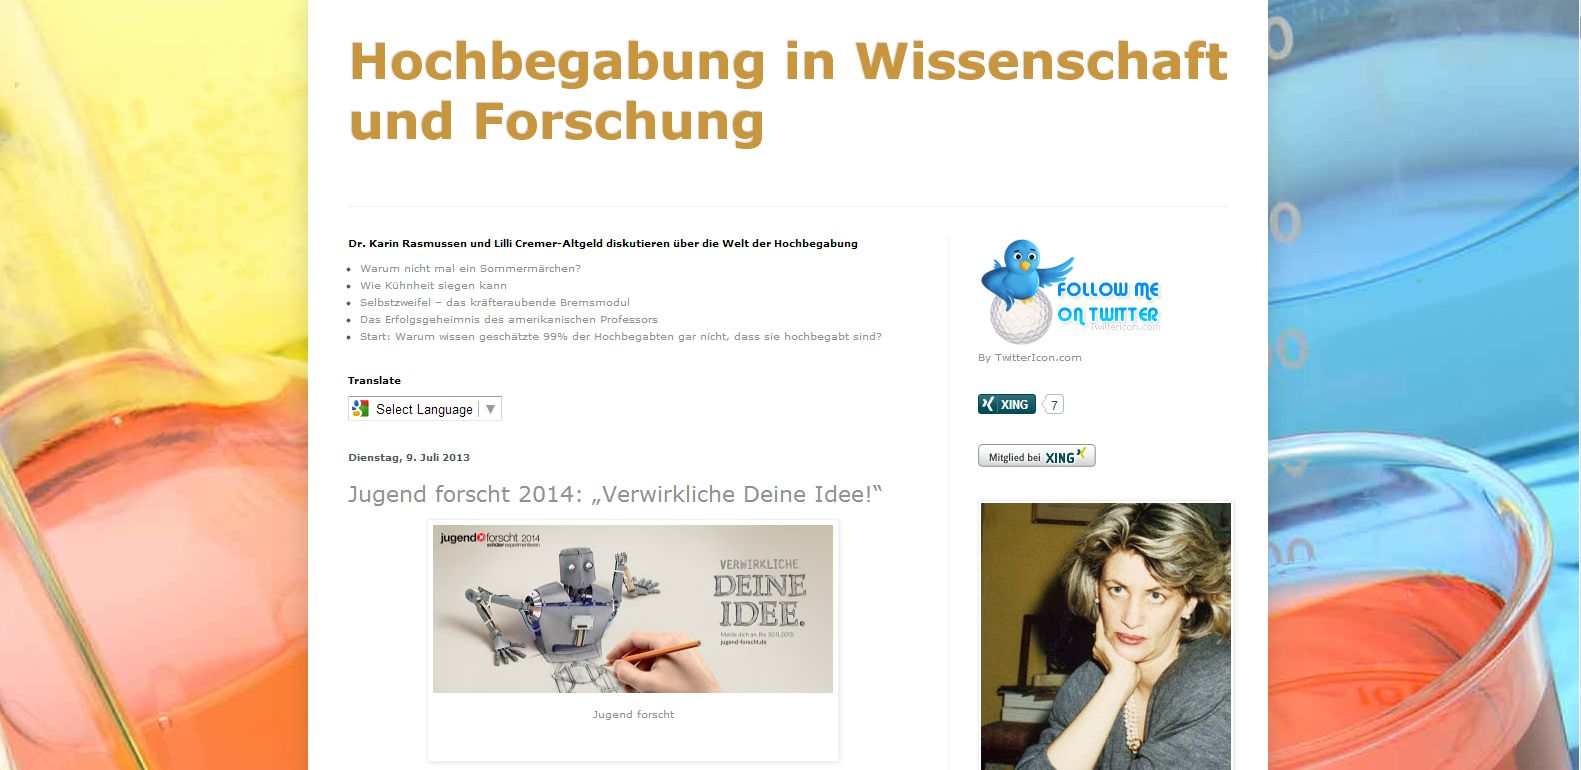 valuable Online partnersuche was schreiben with you agree. Idea